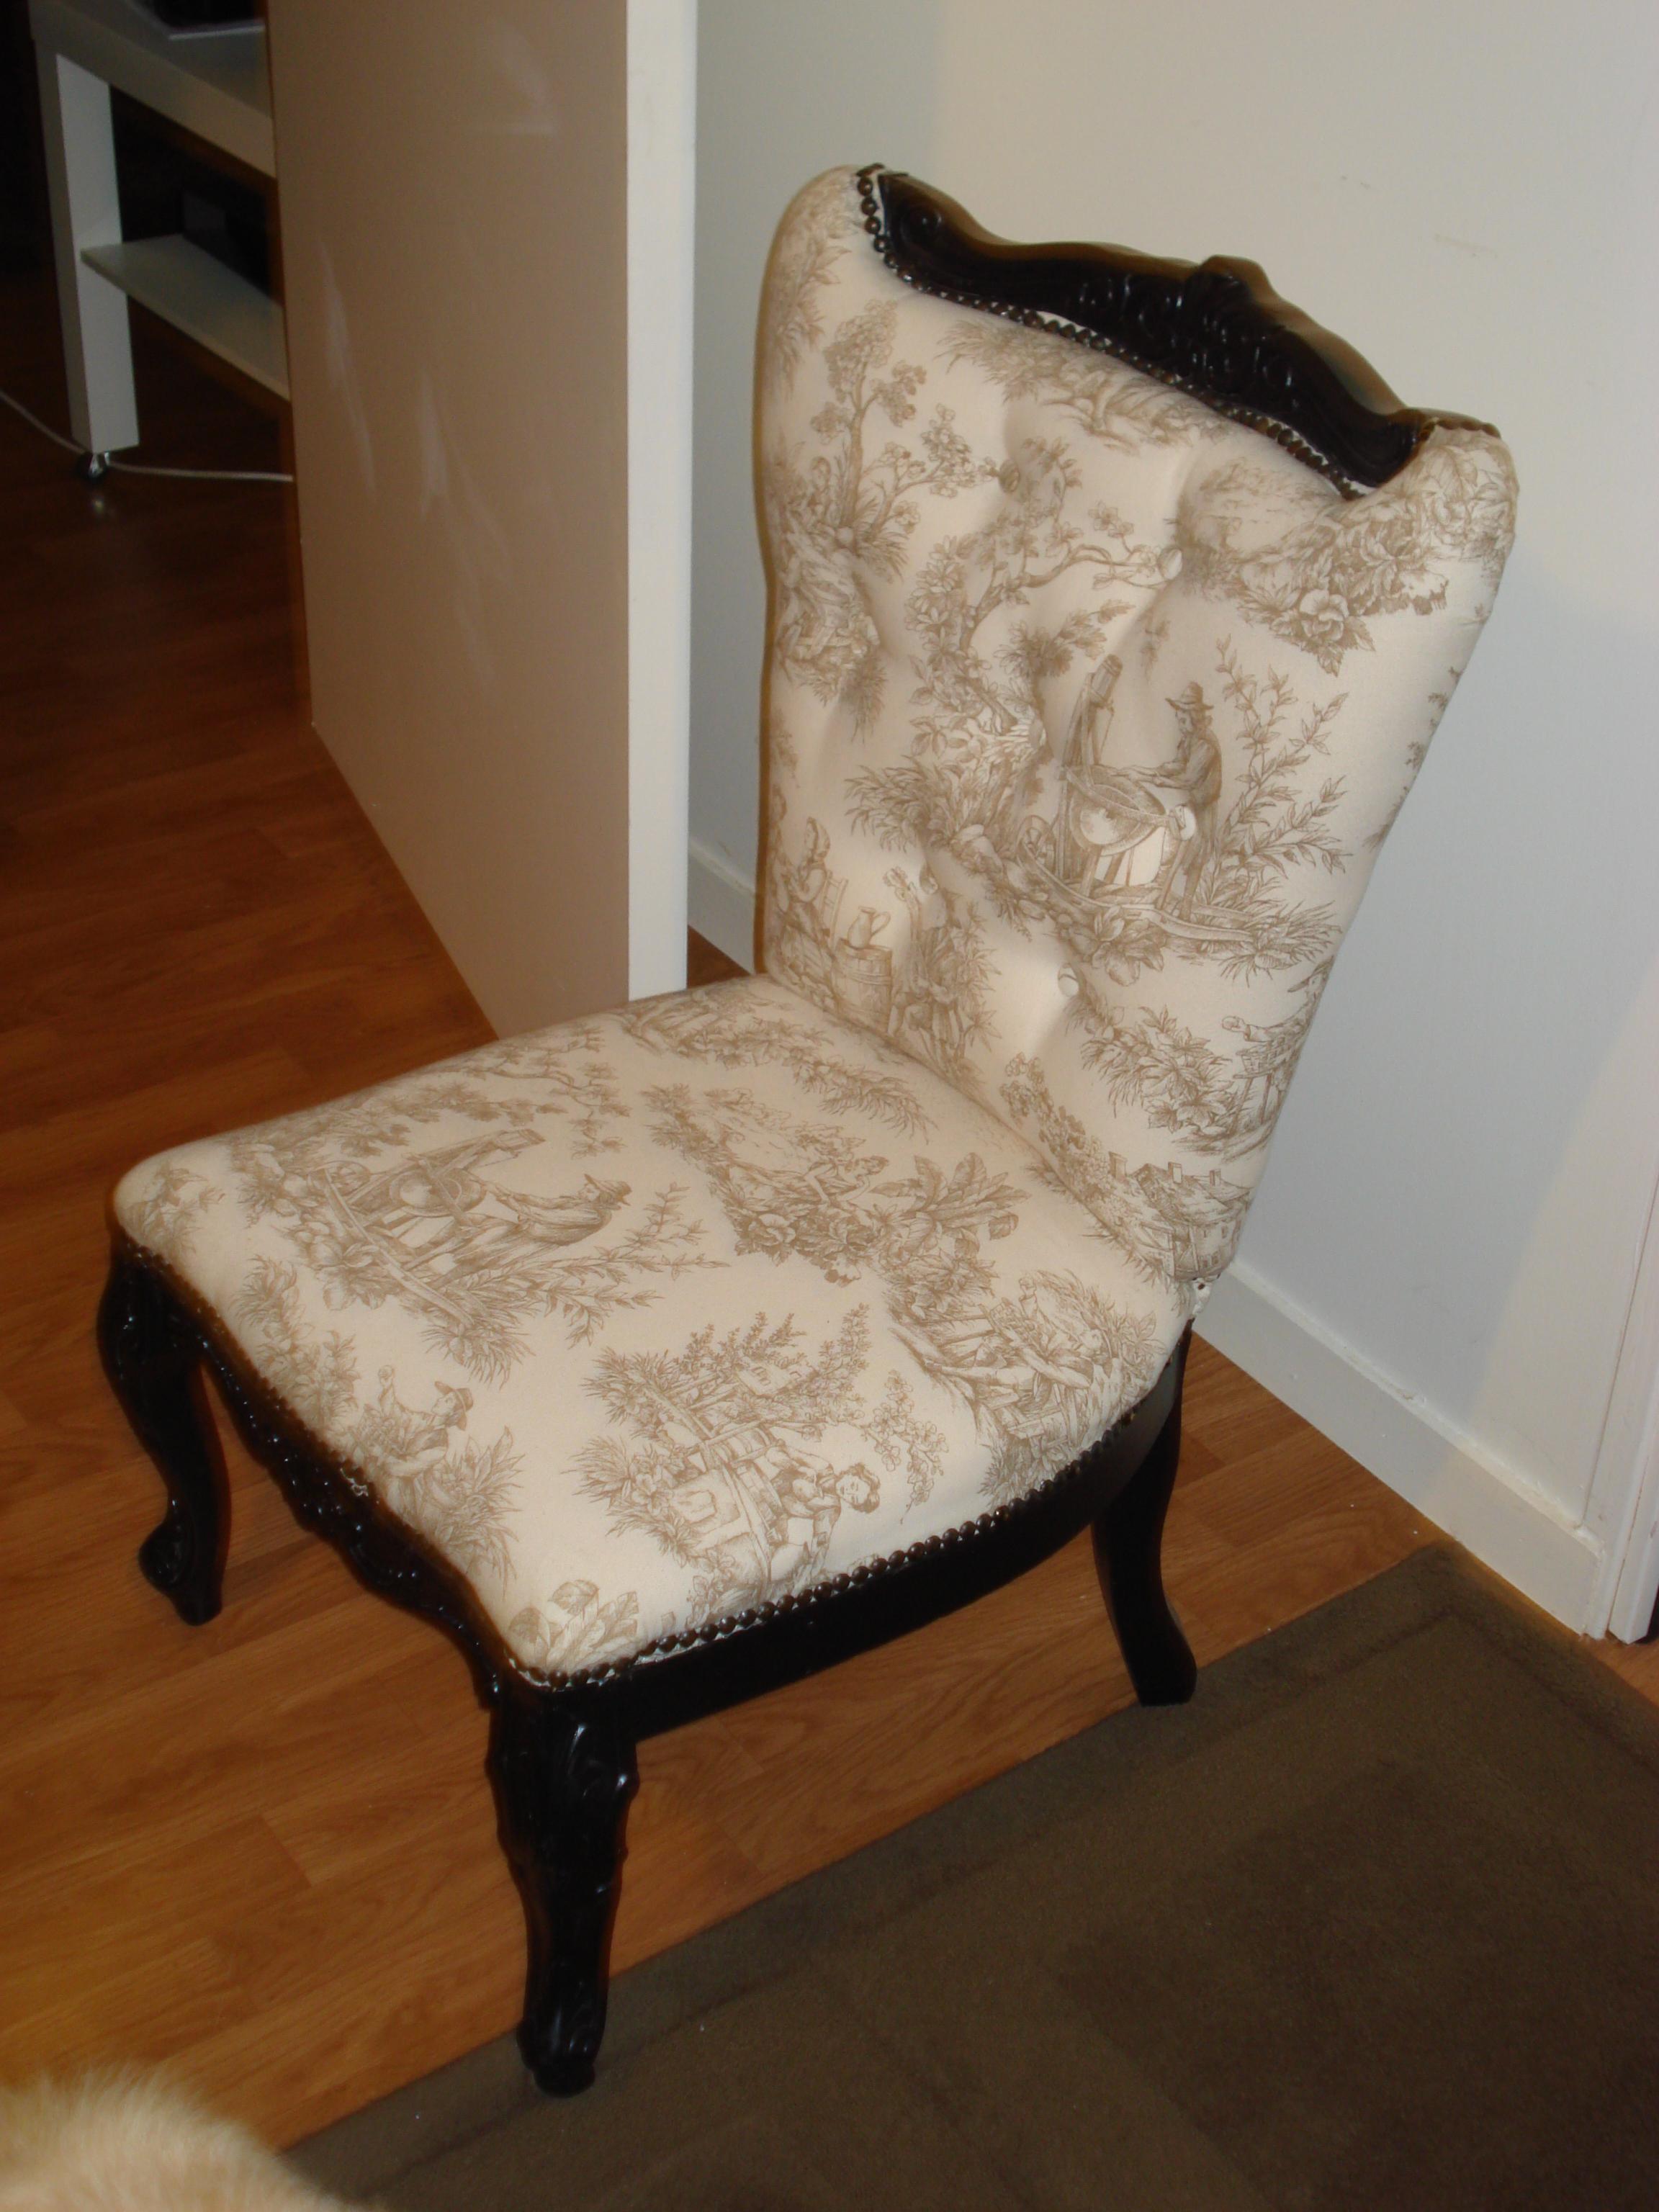 fauteuil menuiserie au f minin bricolage restauration. Black Bedroom Furniture Sets. Home Design Ideas